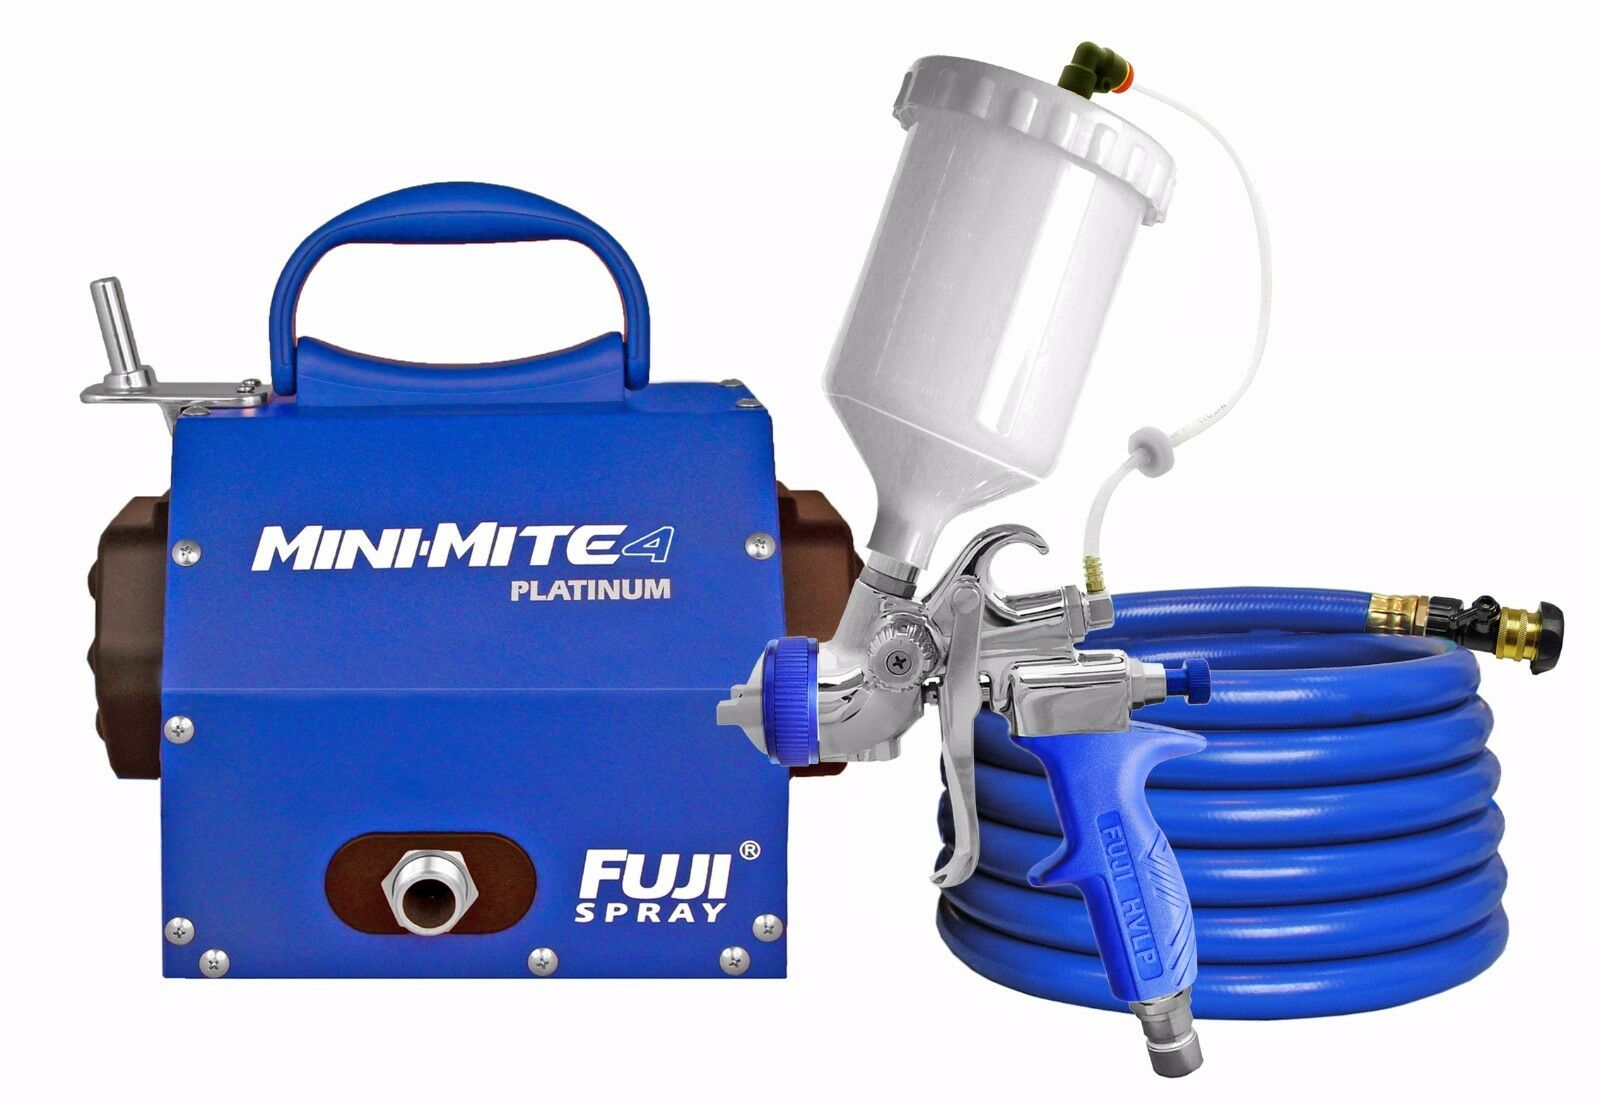 2804-T75G Mini-Mite 4™ Fuji Spray HVLP PLATINUM PLATINUM PLATINUM System w/ FREE Gun Cleaning Kit 344c06